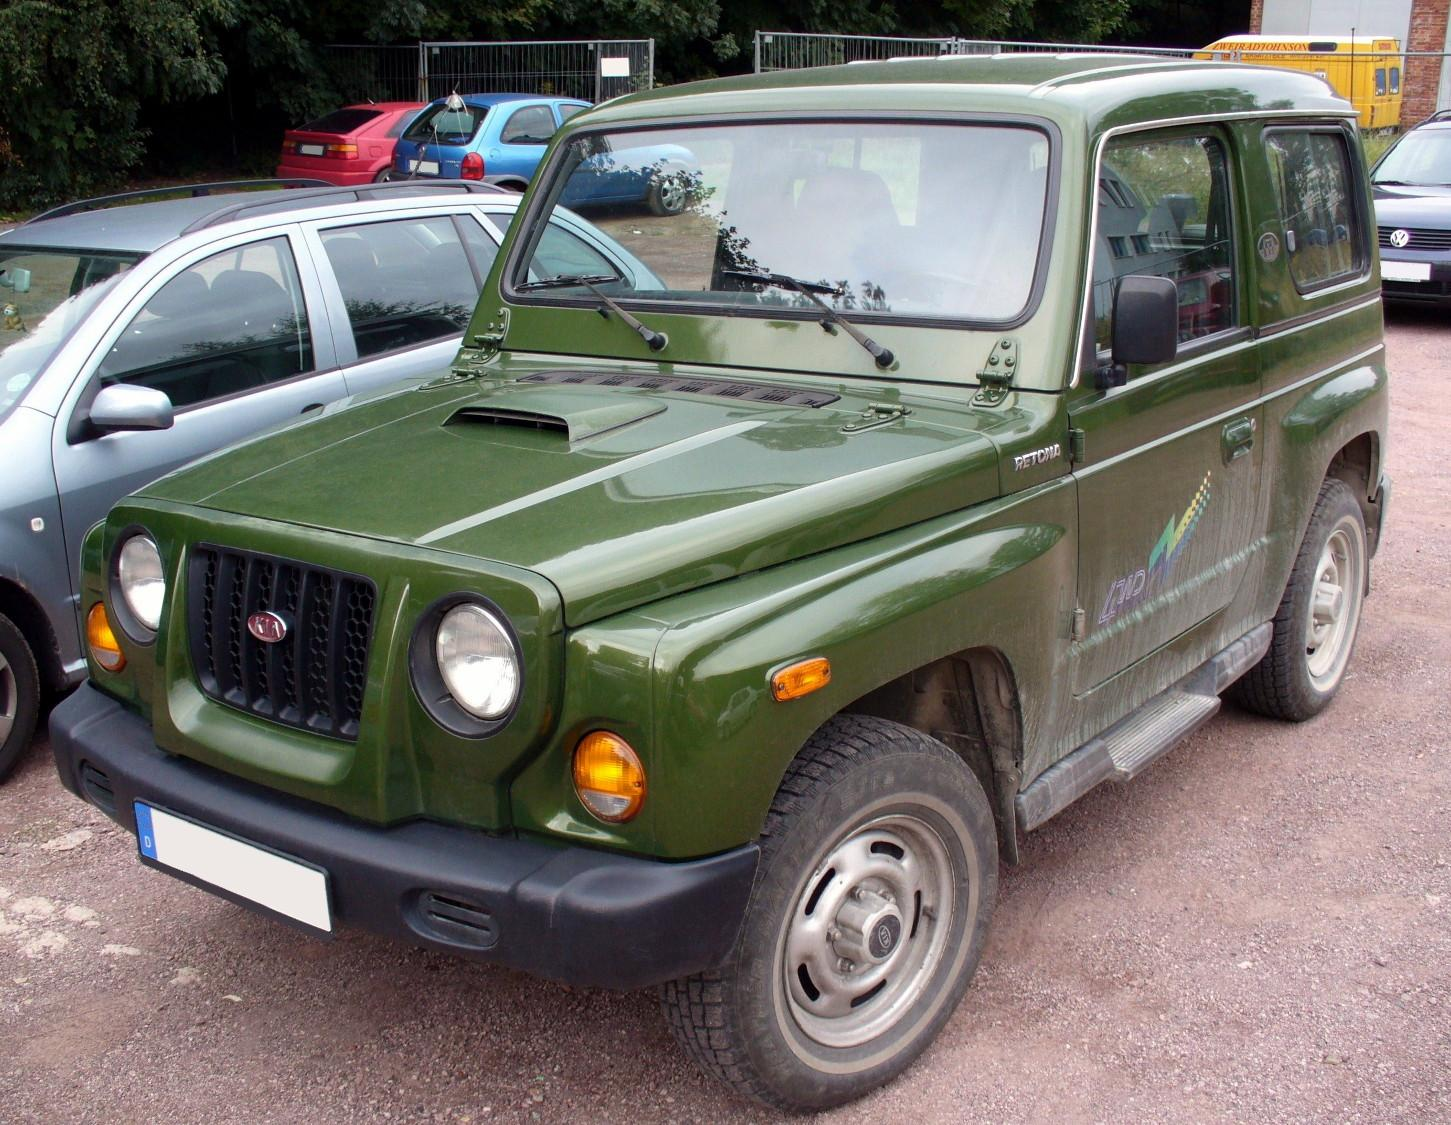 Img additionally Rh Cx in addition Hpim further Navara additionally Dsc. on 1999 jeep wrangler